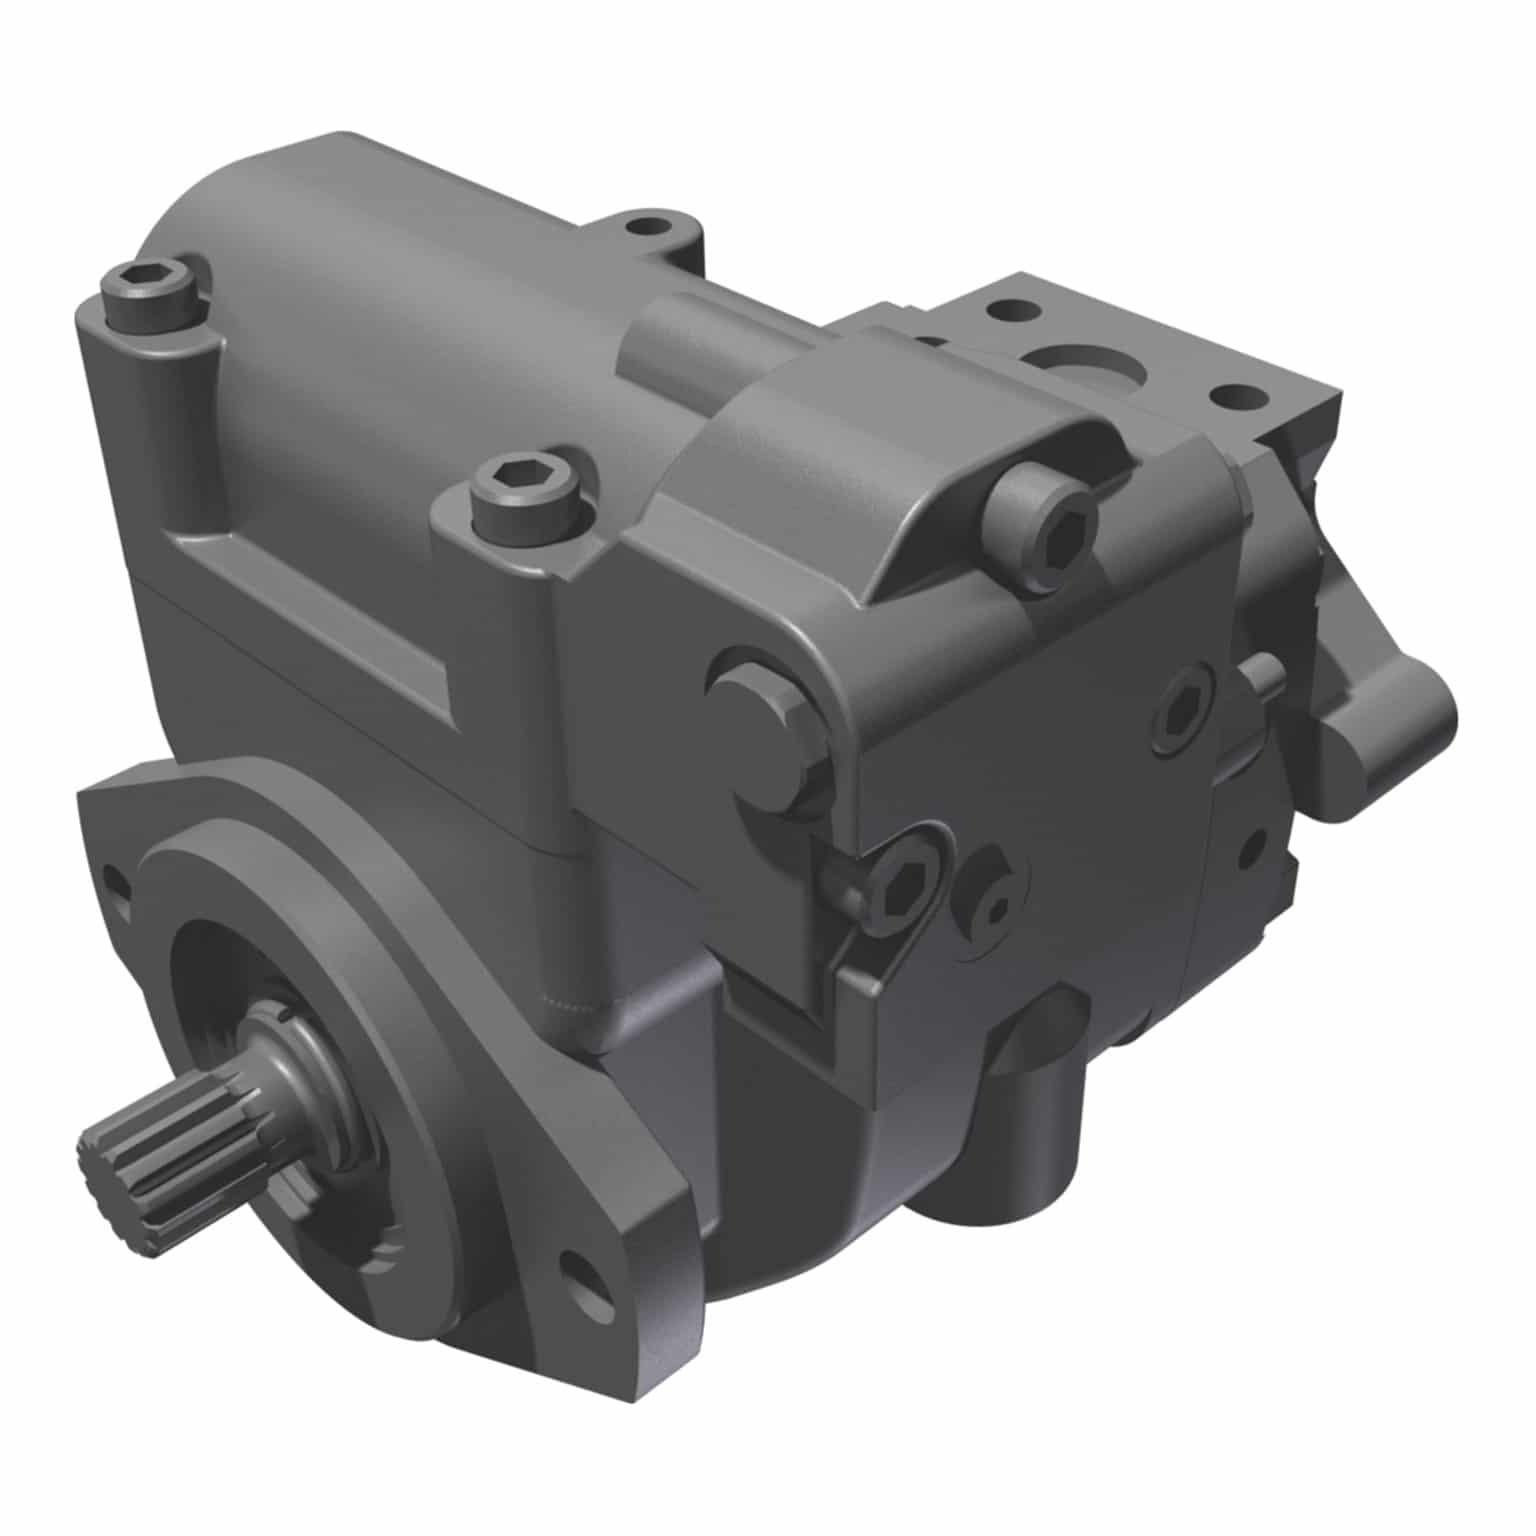 Axial Flow Valves Class 300 : Oilgear best under pressure